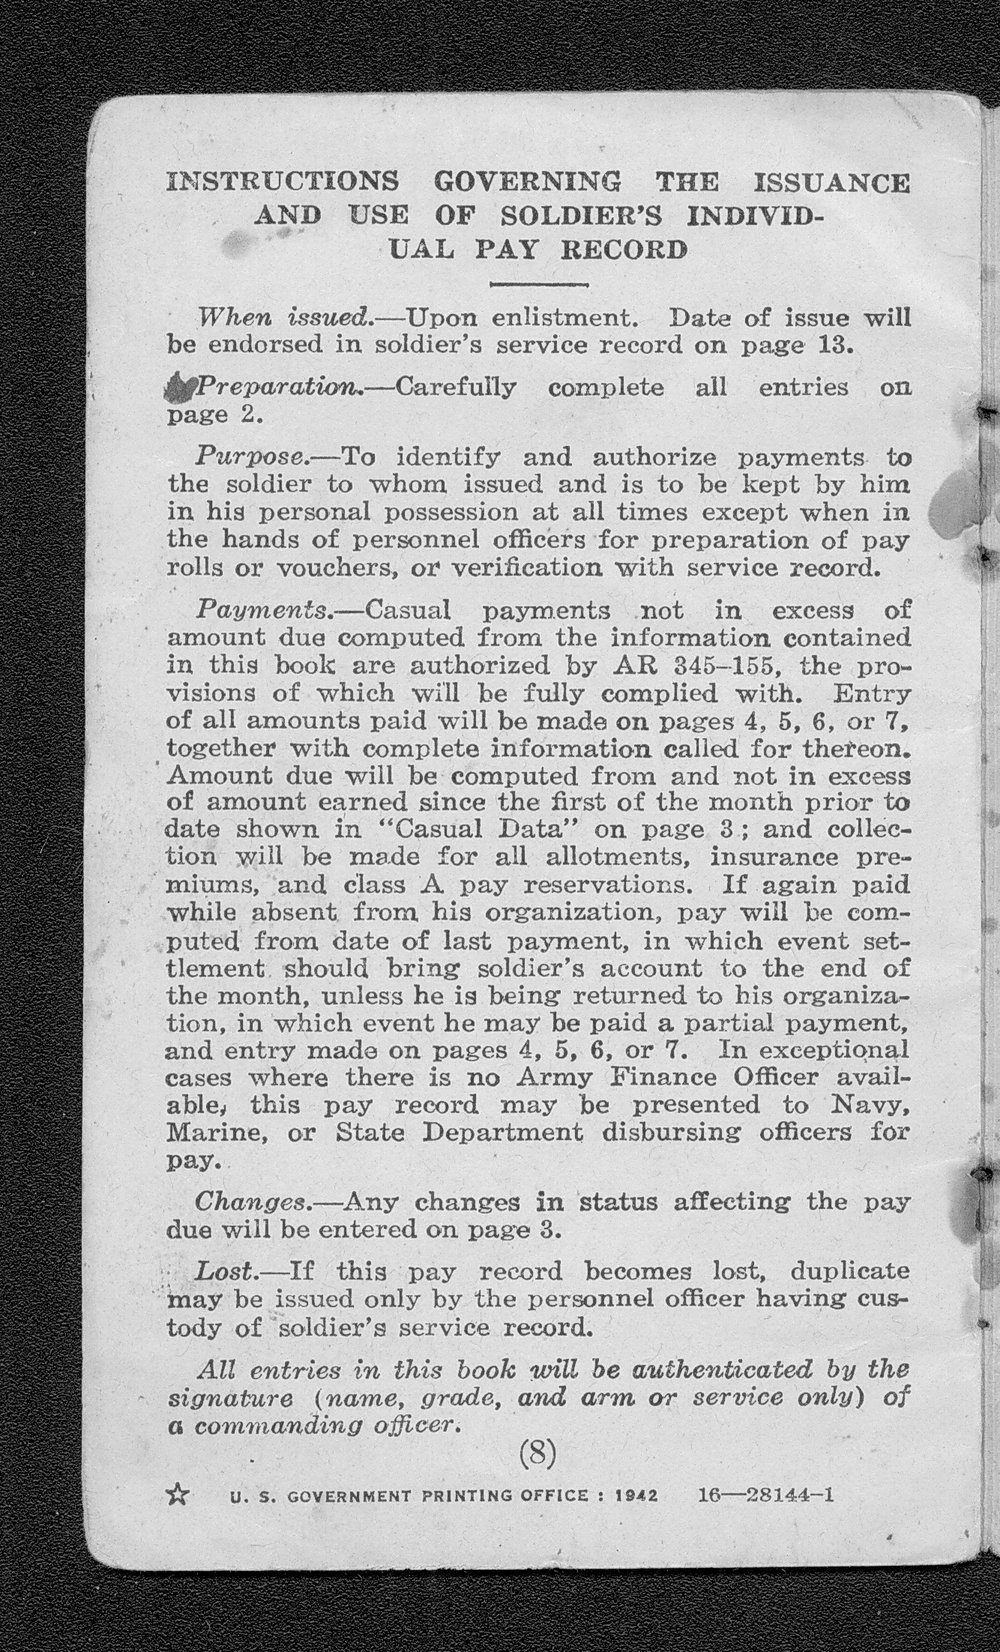 Carrol Victor Christian to Floriene Olive Graham Christian correspondece - 6